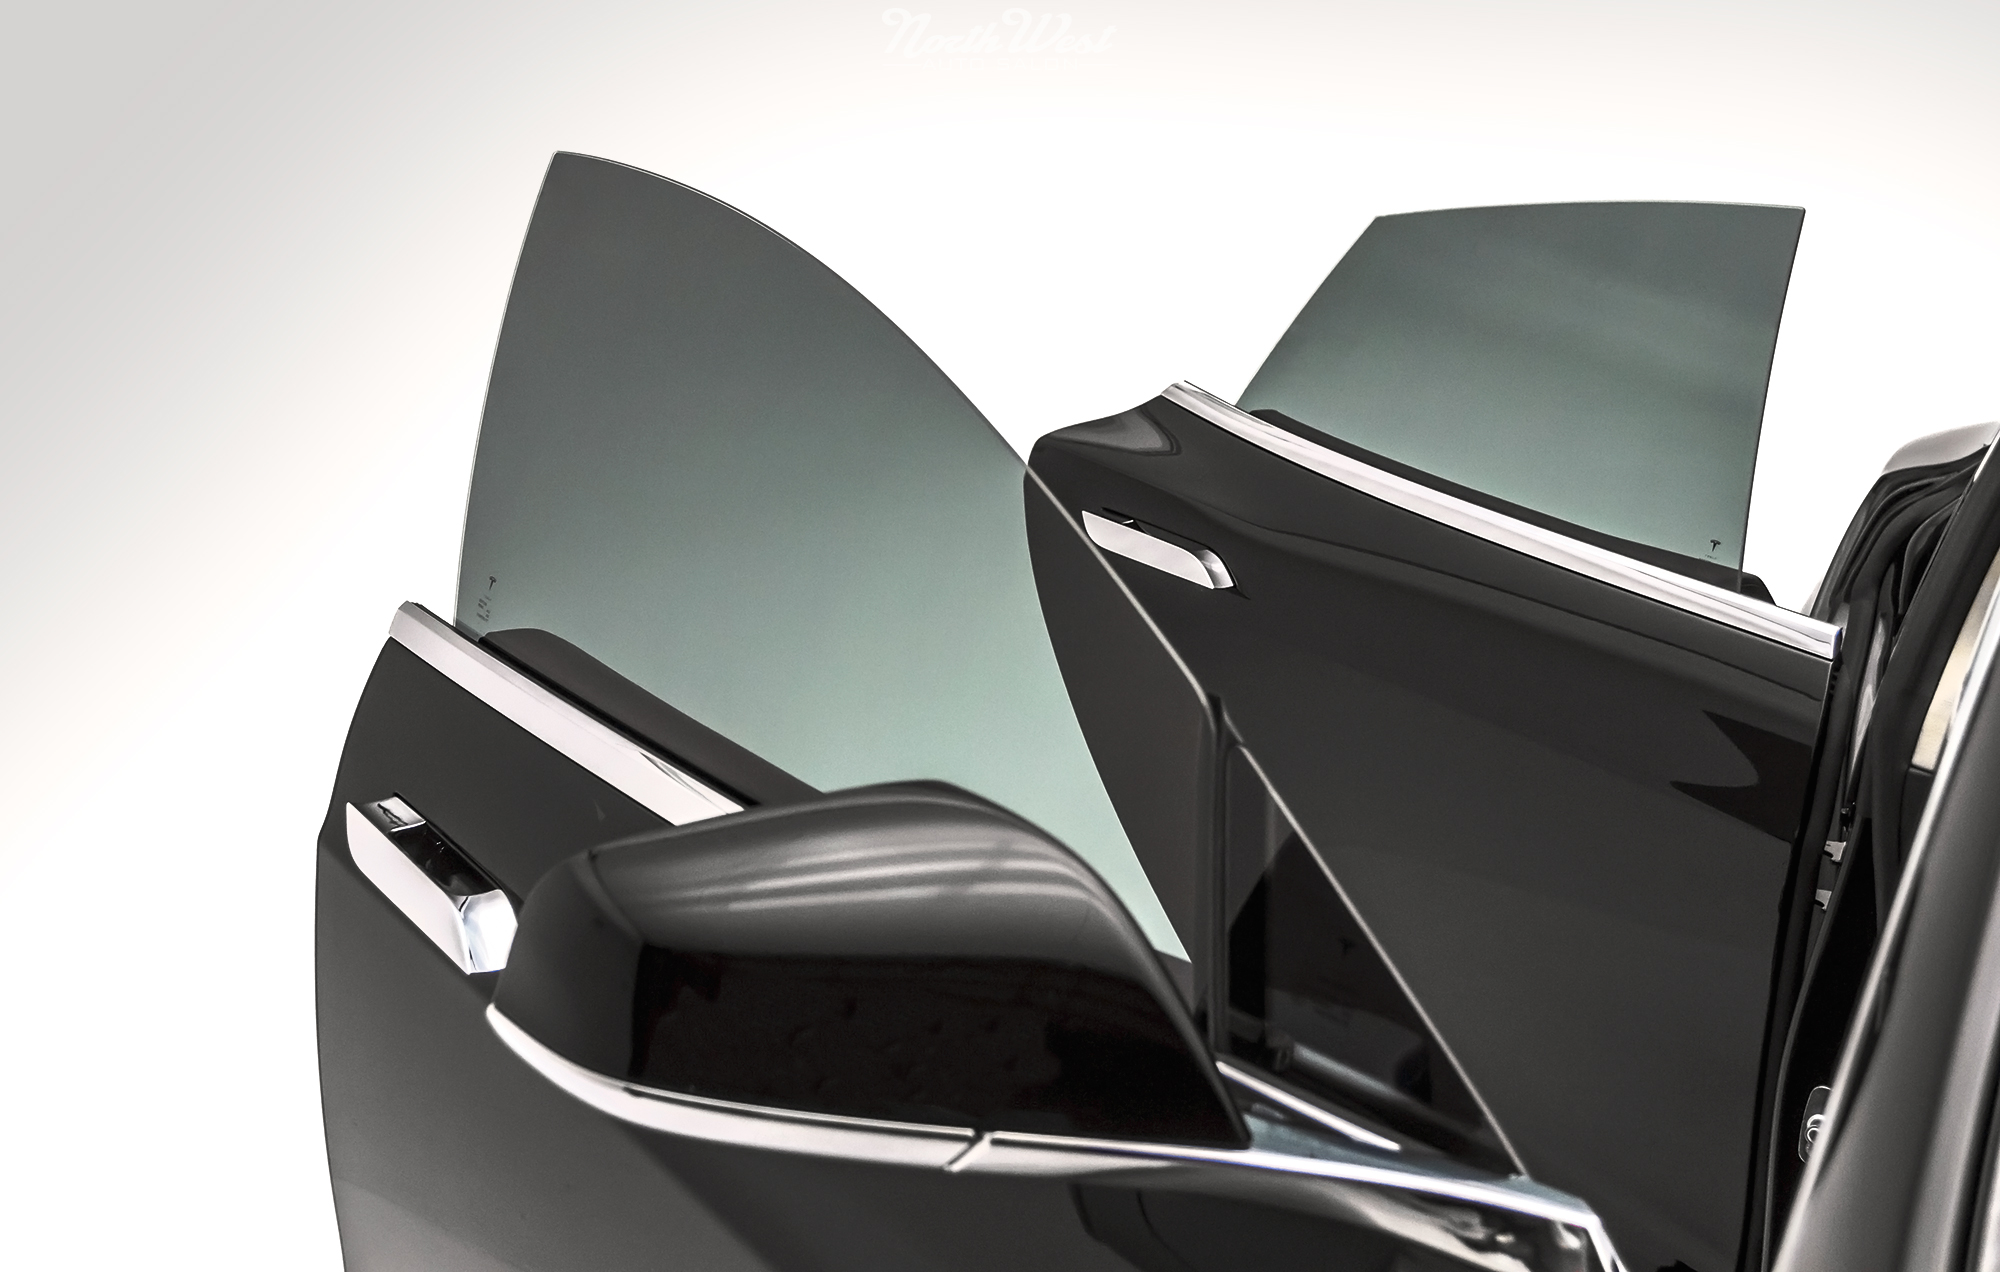 Tesla-Motors-Model-S-Window-Tint-Prestige-PhotoSync-film-installed-after-7.jpg